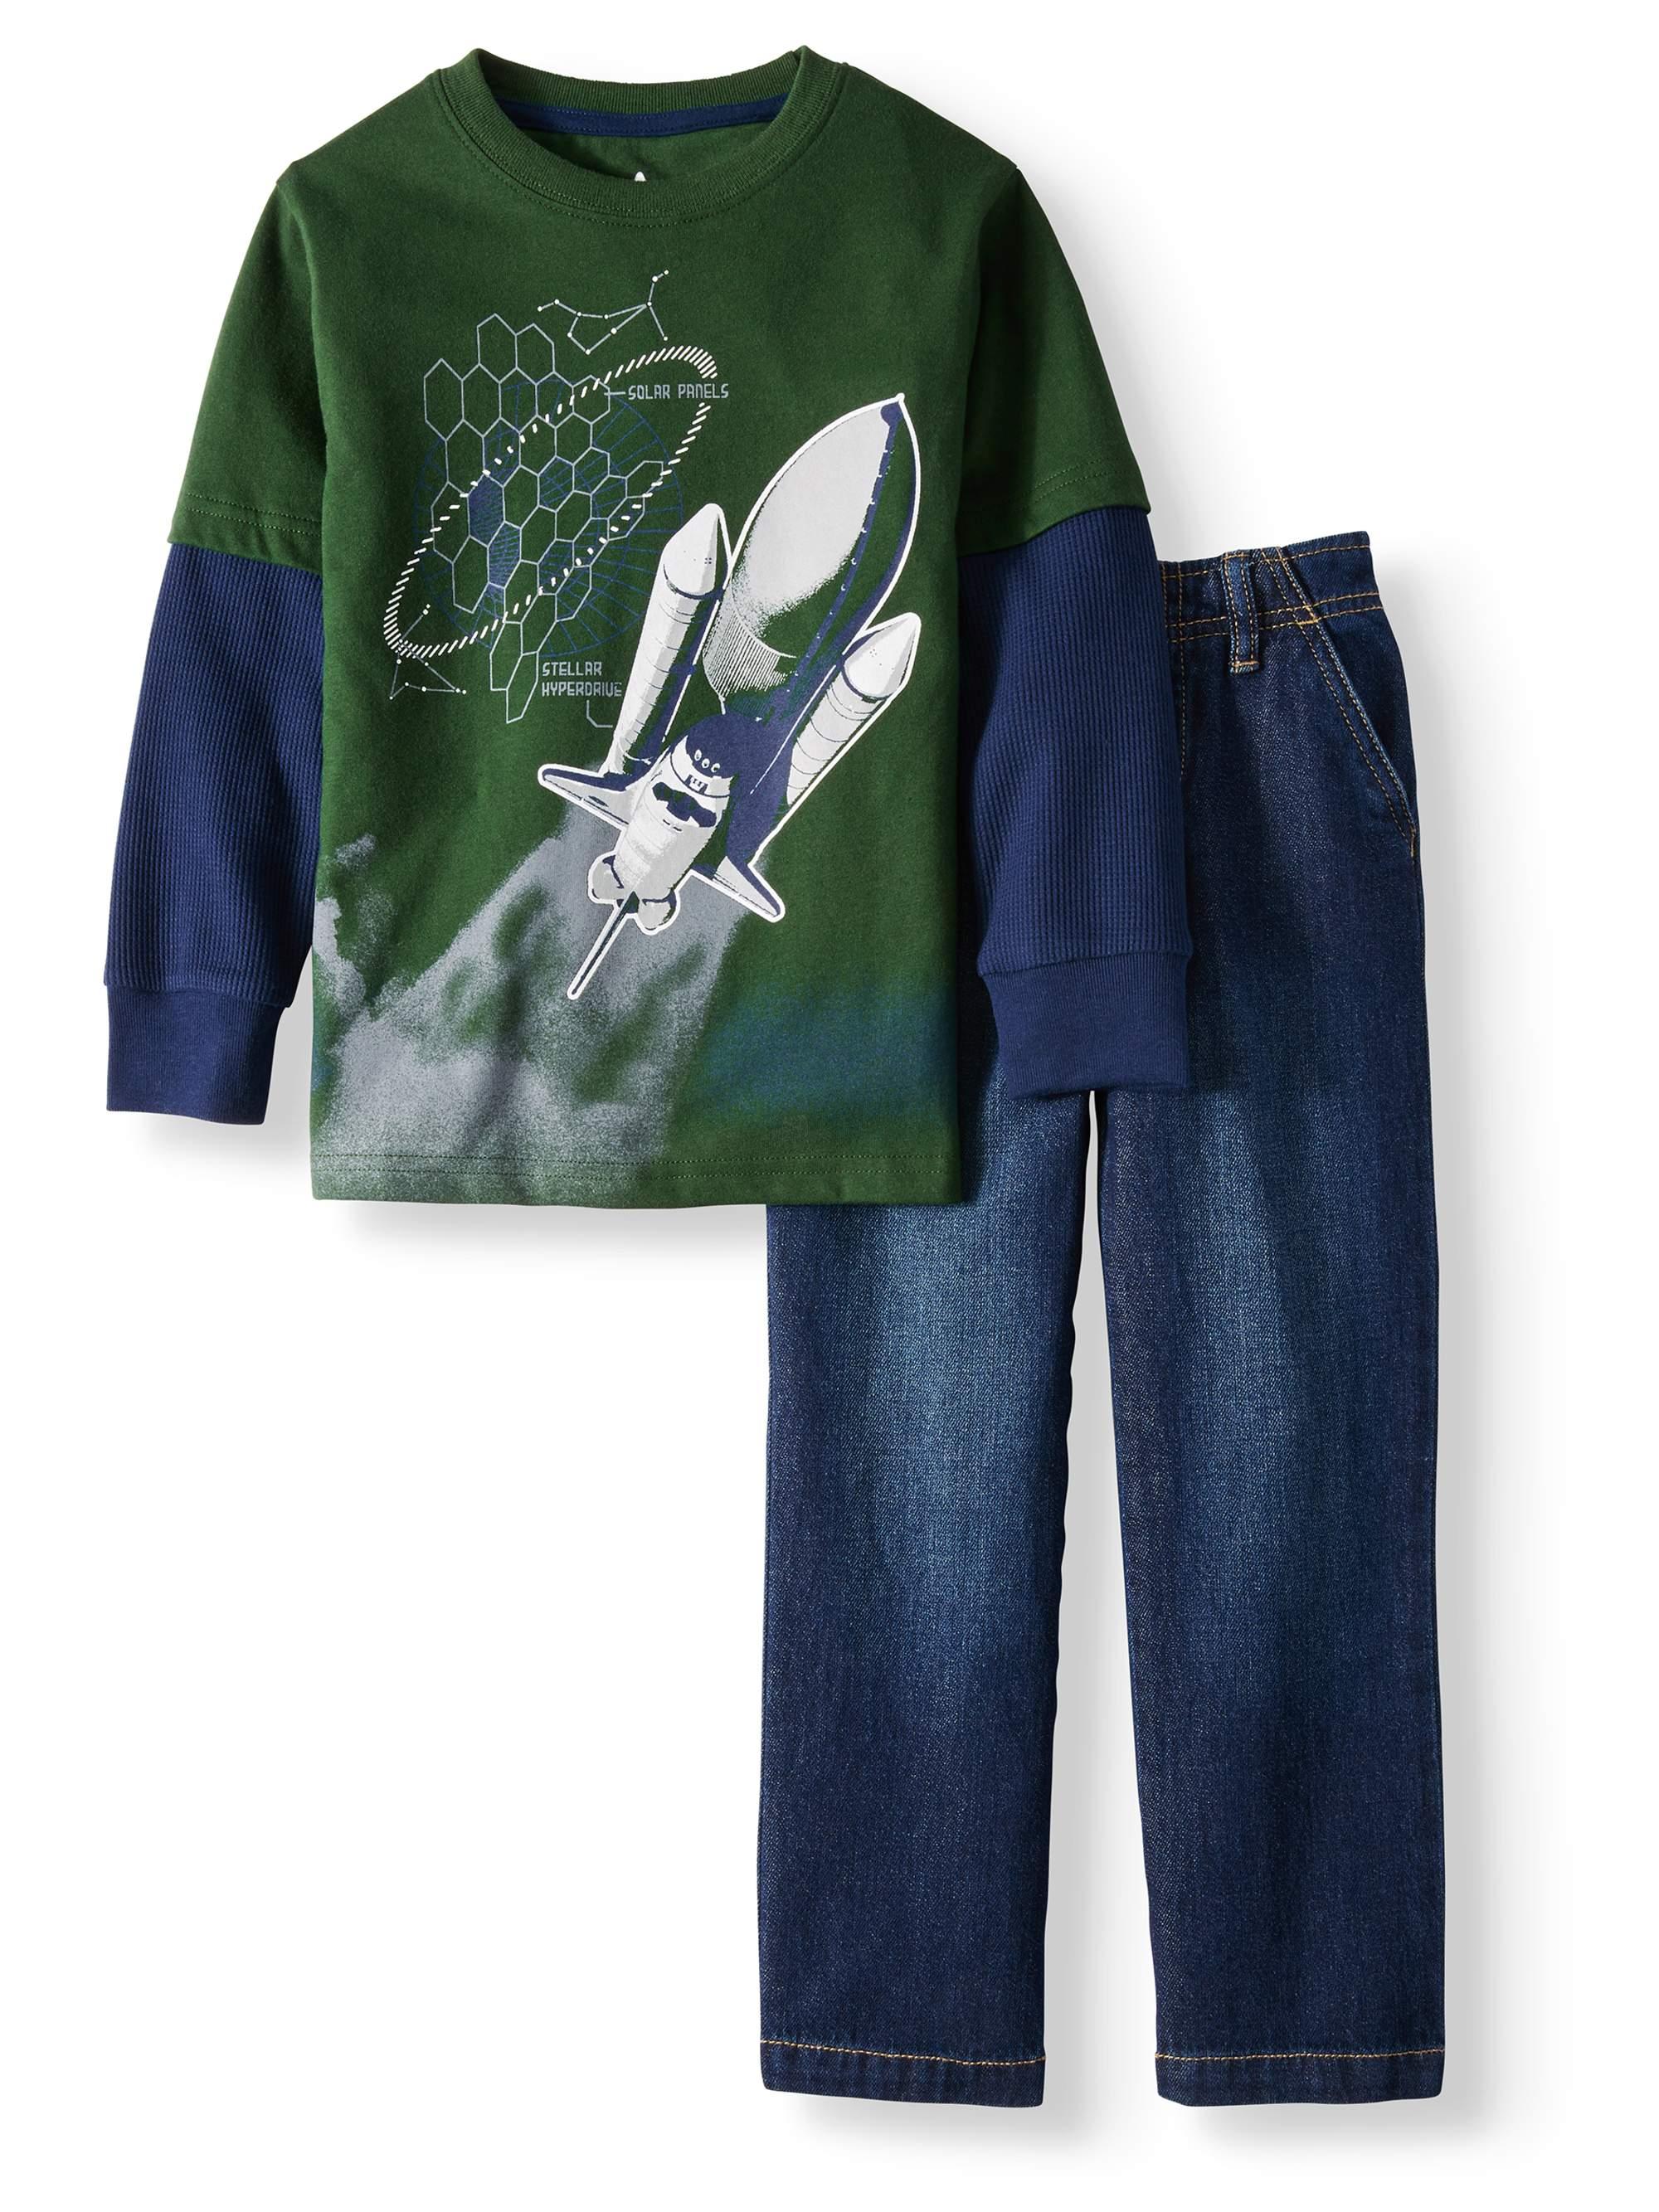 365 Kids From Garanimals Long Sleeve Hangdown Graphic T-Shirt & Pants, 2pc Outfit Set (Little Boys & Big Boys)